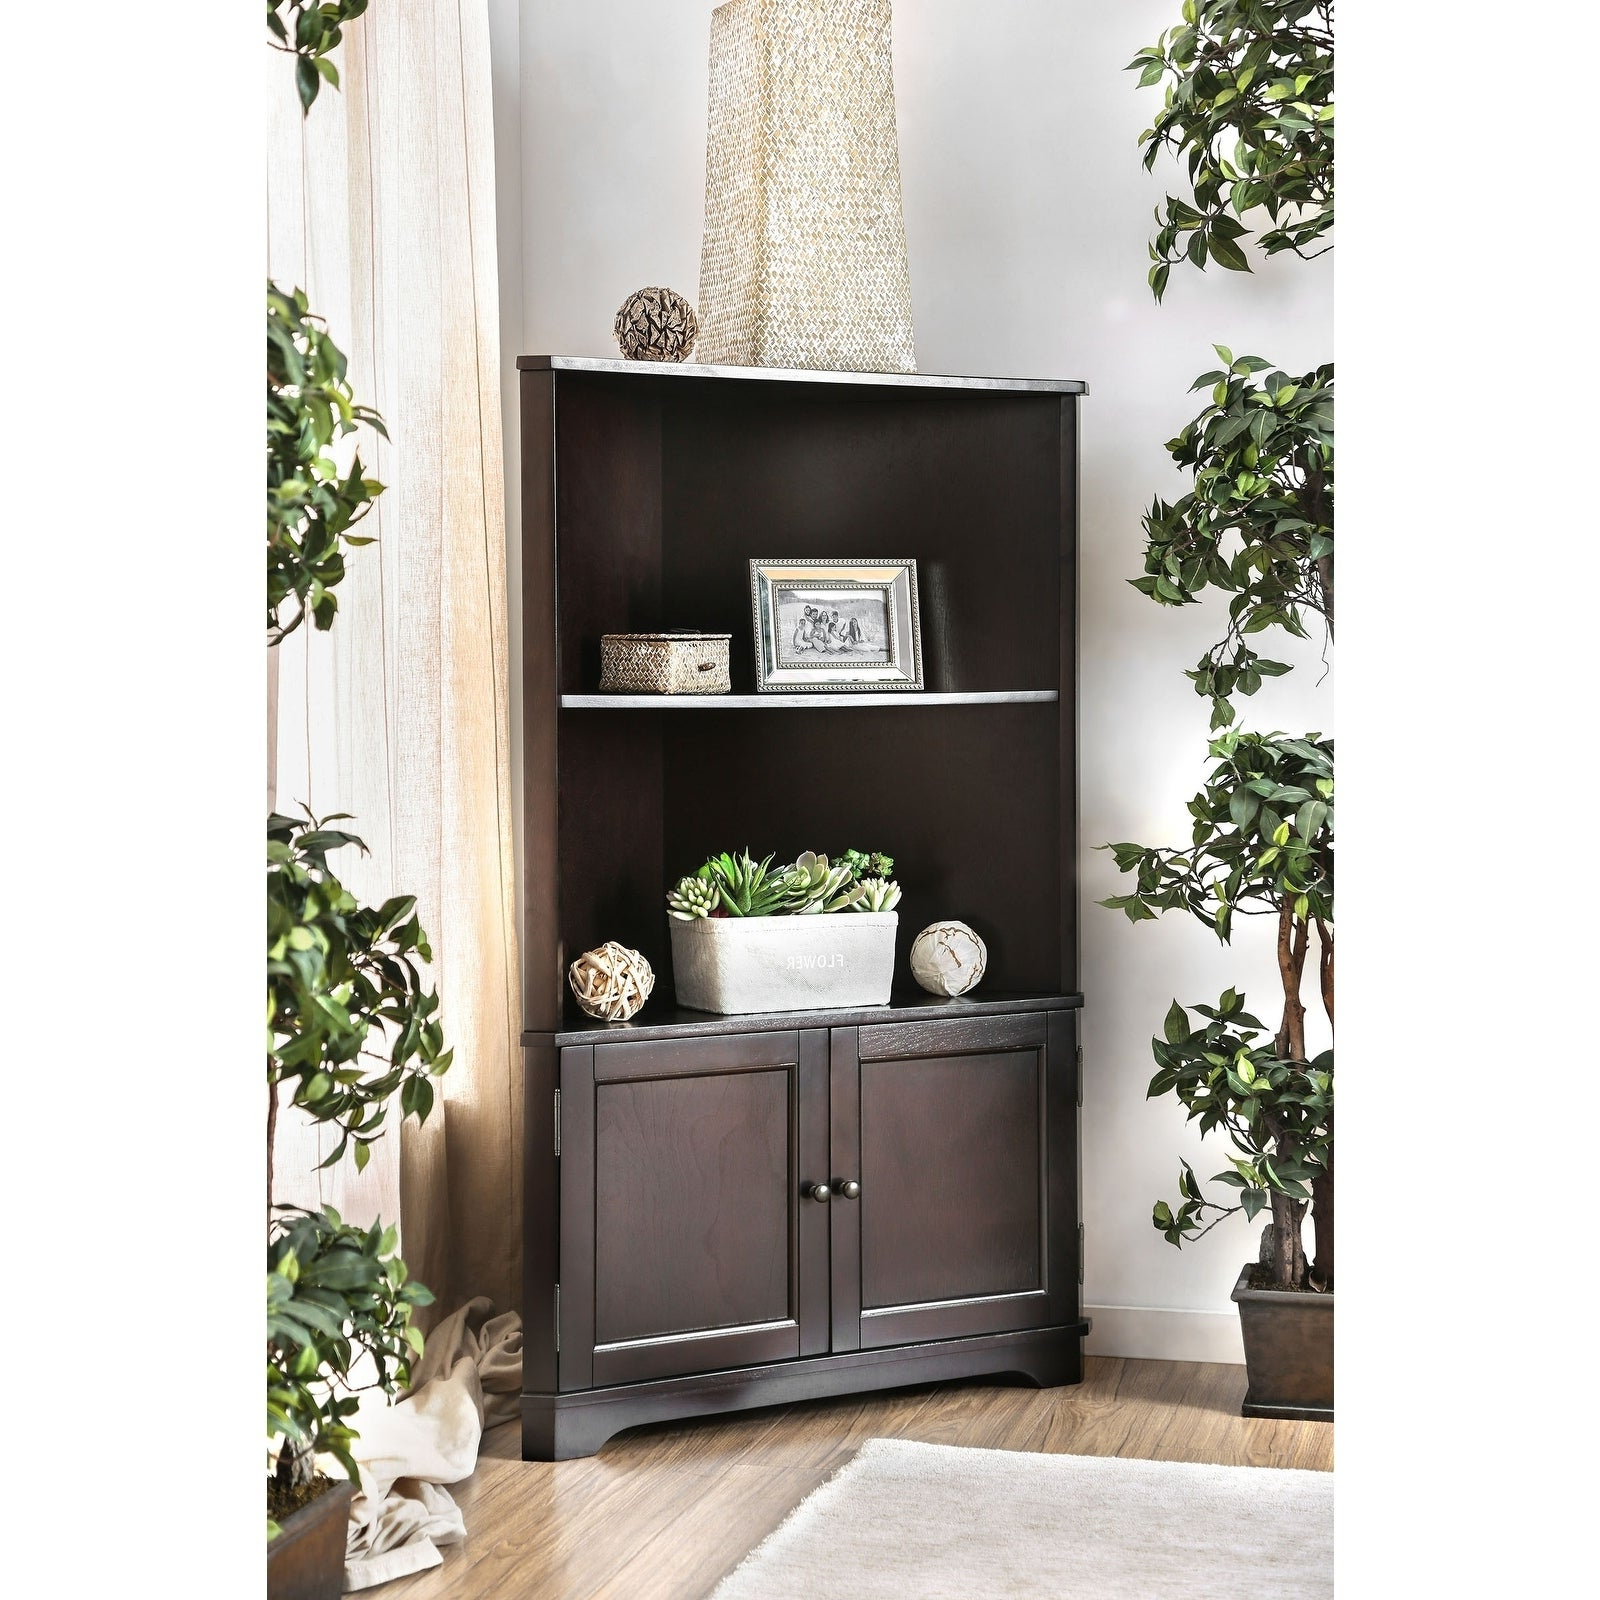 Williams Import Cavan Contemporary Bookshelf In Dark Walnut In Popular Vas Corner Bookcases (View 20 of 20)